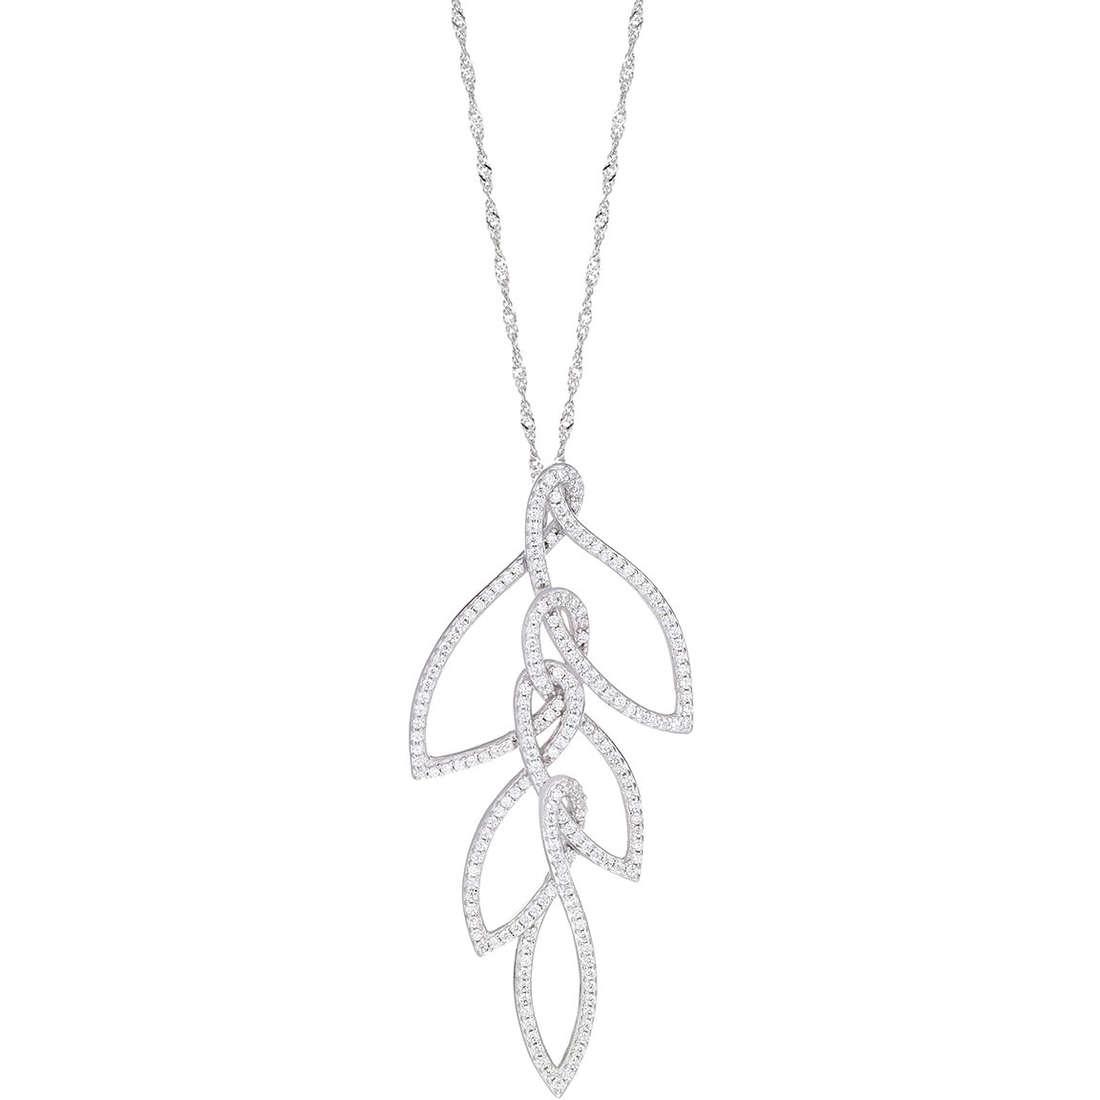 necklace woman jewellery Morellato 1930 Michelle Hunziker SAHA04